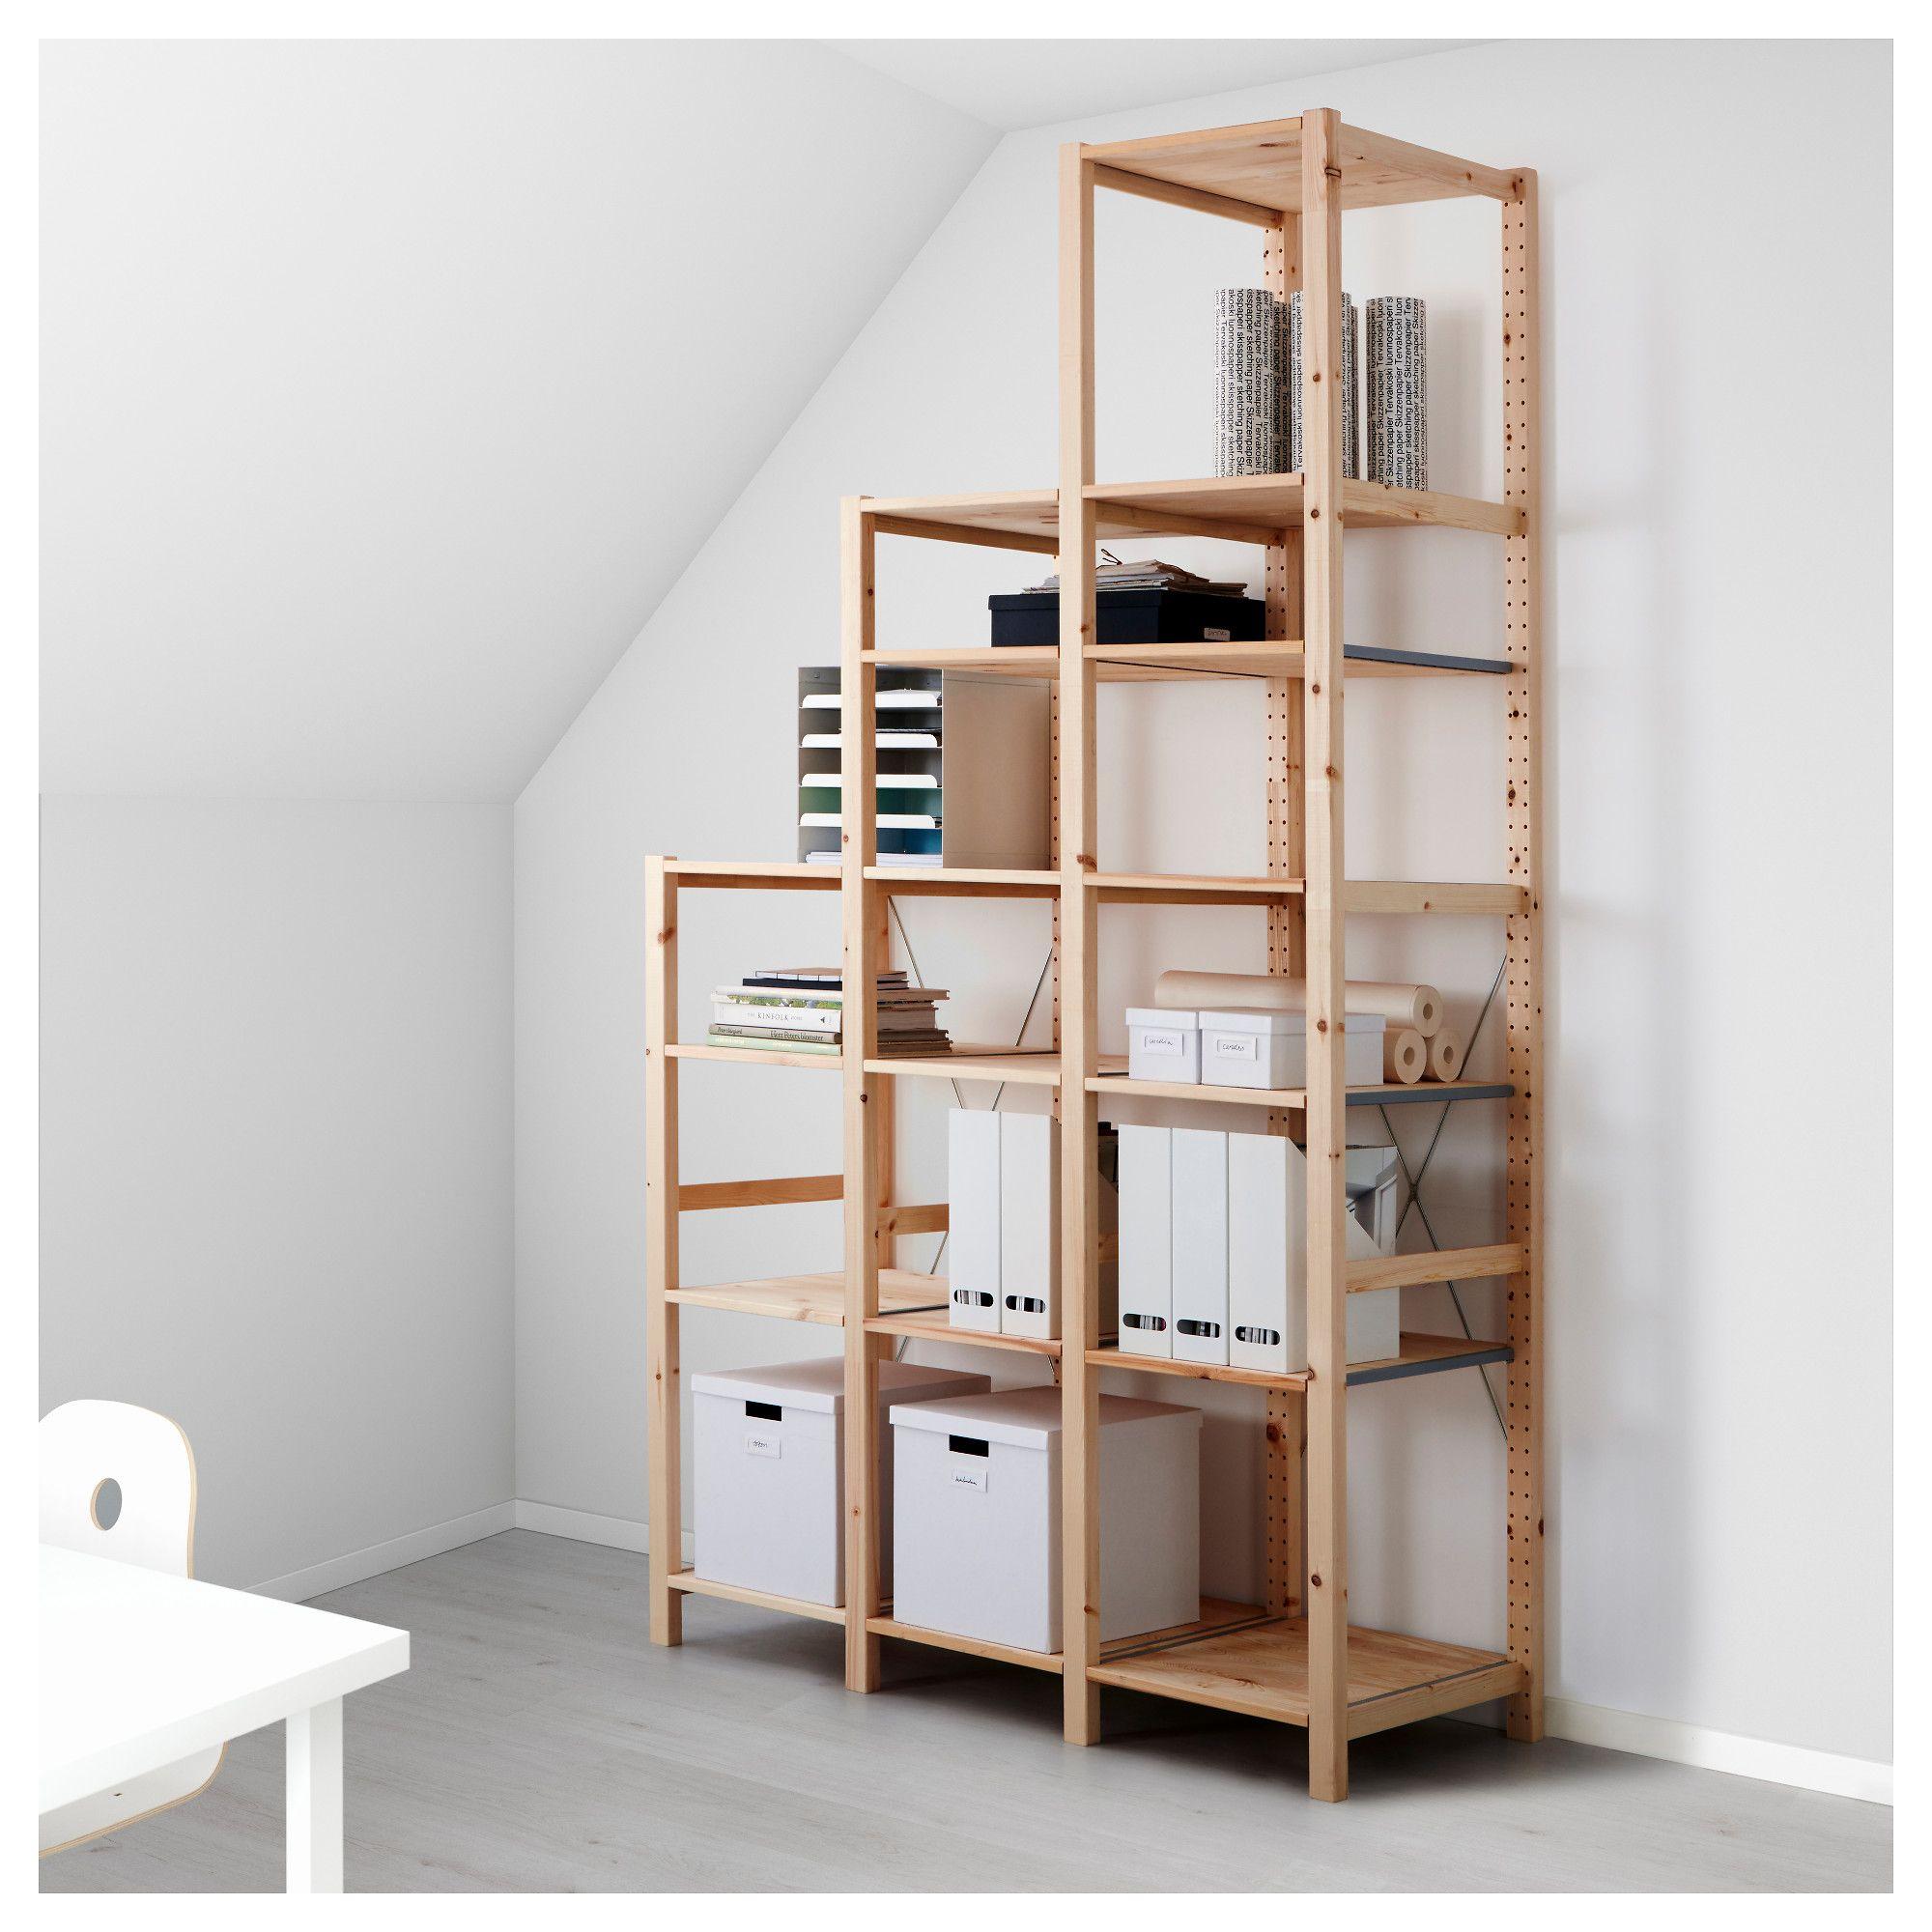 Us Furniture And Home Furnishings Ikea Shelving Unit Ikea Ivar Shelving Unit